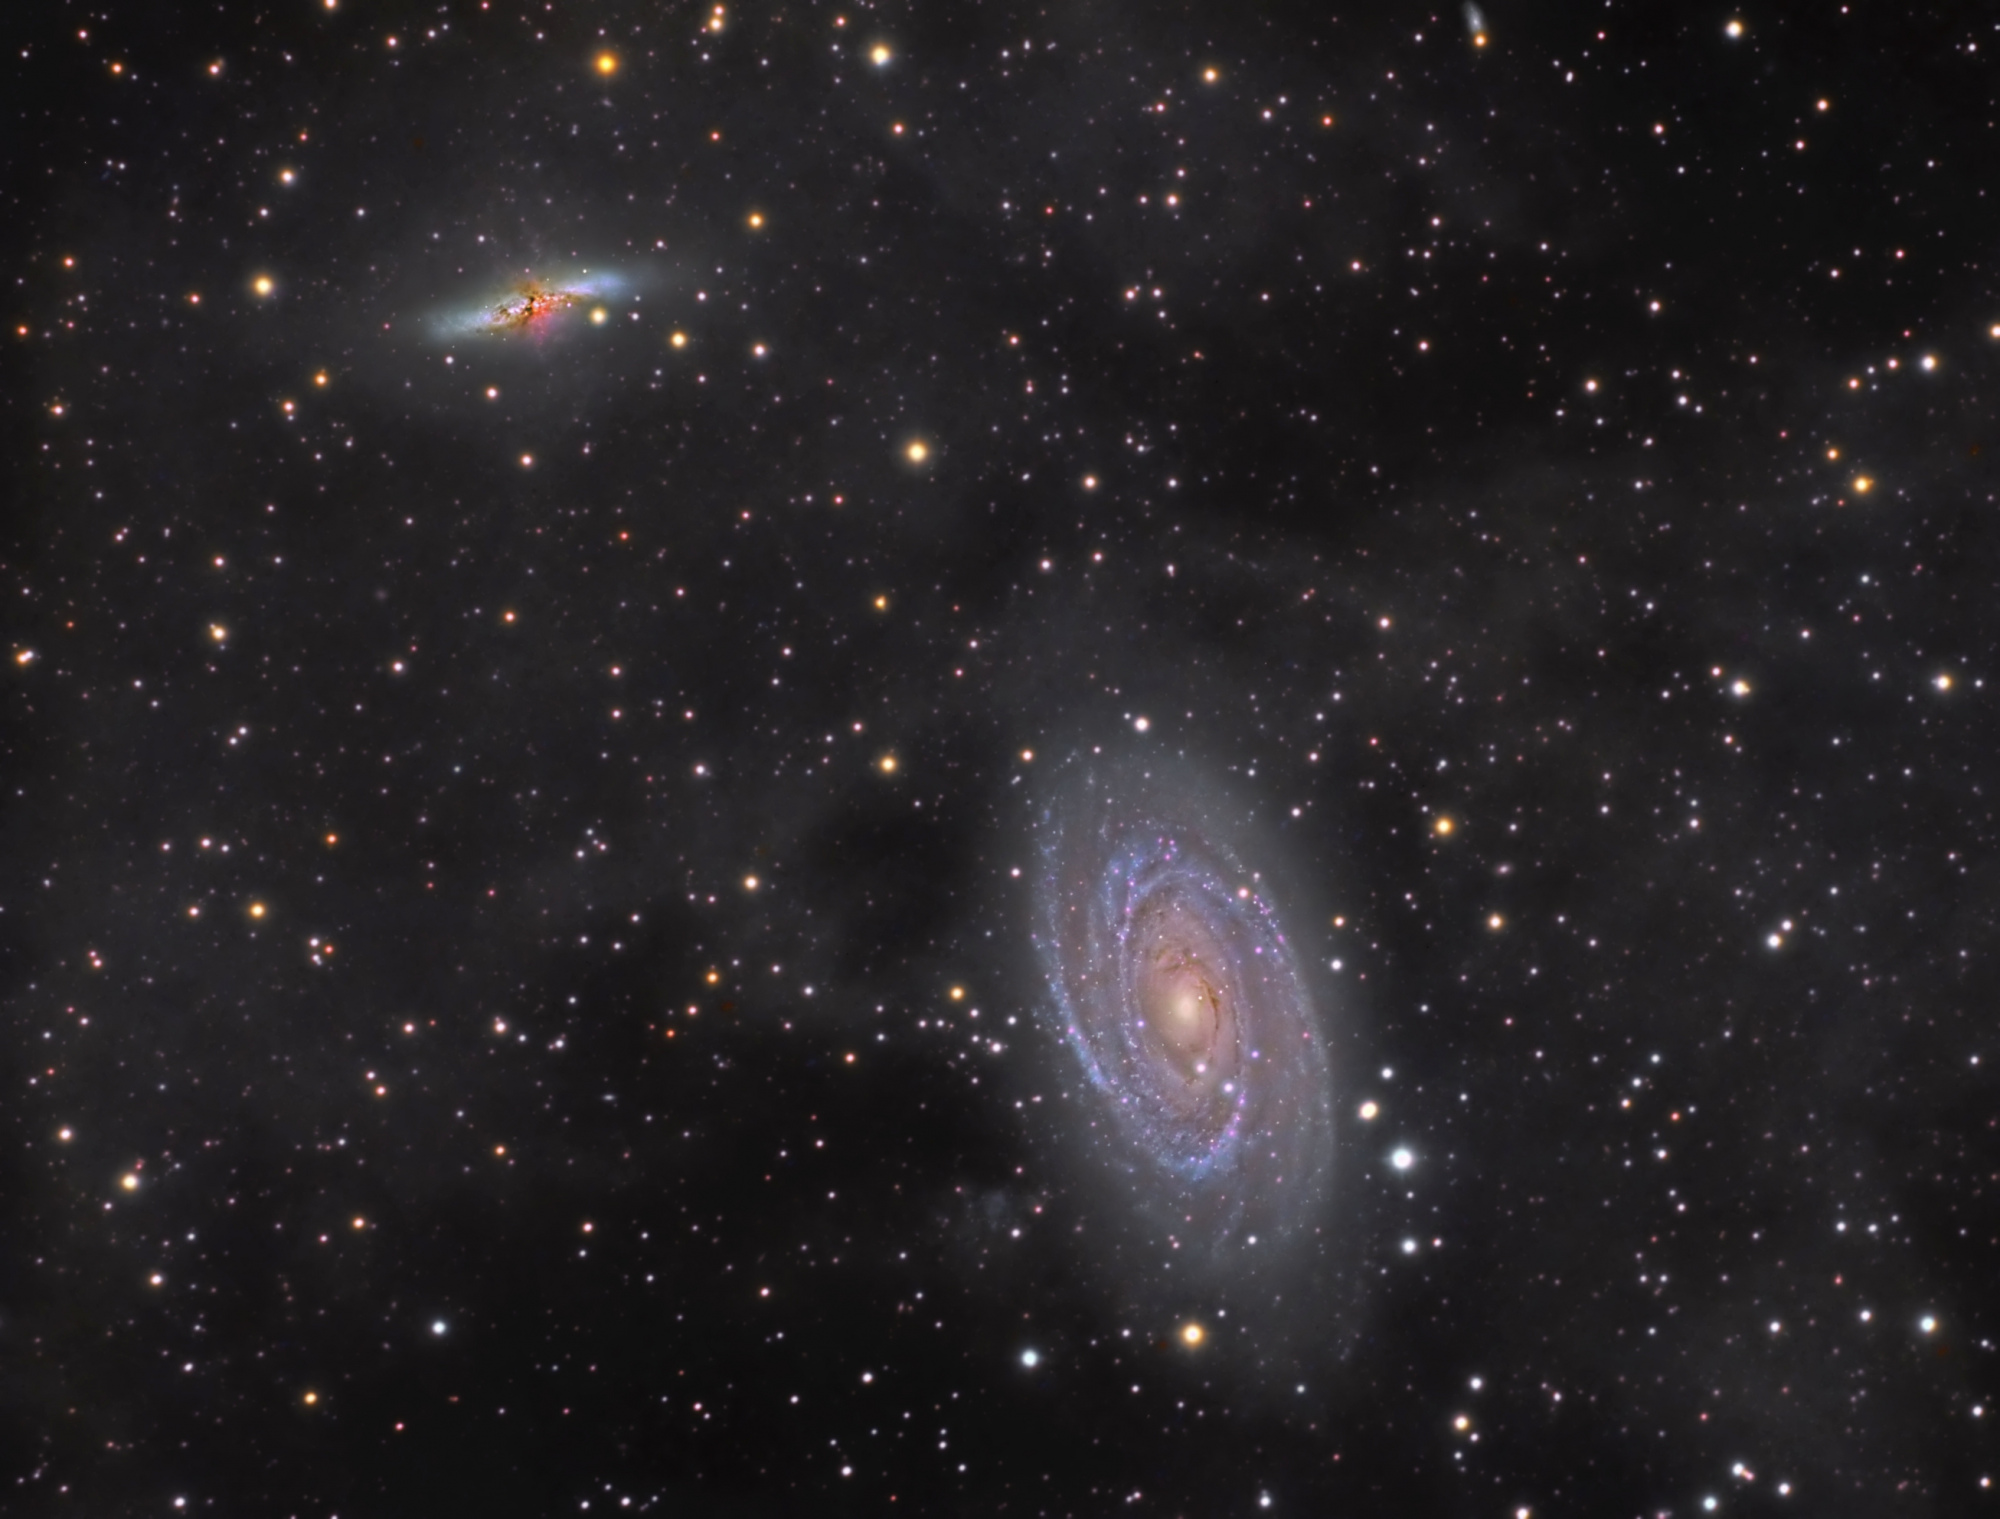 M81_M82_IFN_v4_JC.thumb.jpg.ef9cd605075e1aba7b56c6d4ffb2b220.jpg